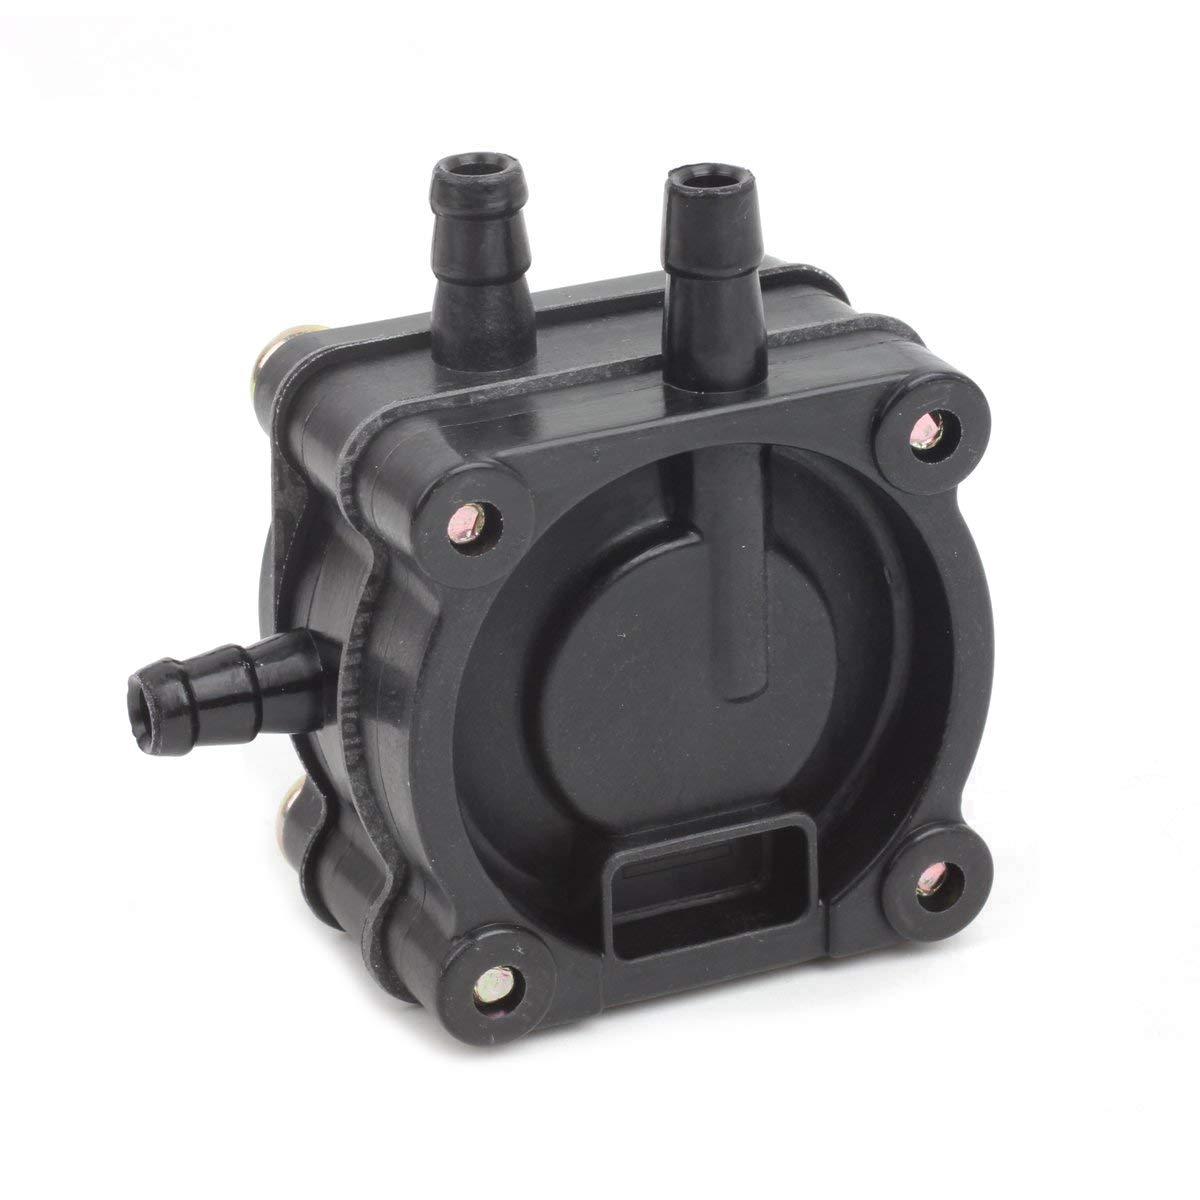 Amhousejoy 35787A Fuel Pump Fits Tecumseh OHM120 OHV110 125 130 135 140 150 160 170 175 180 OV358EA 490EA 691EA